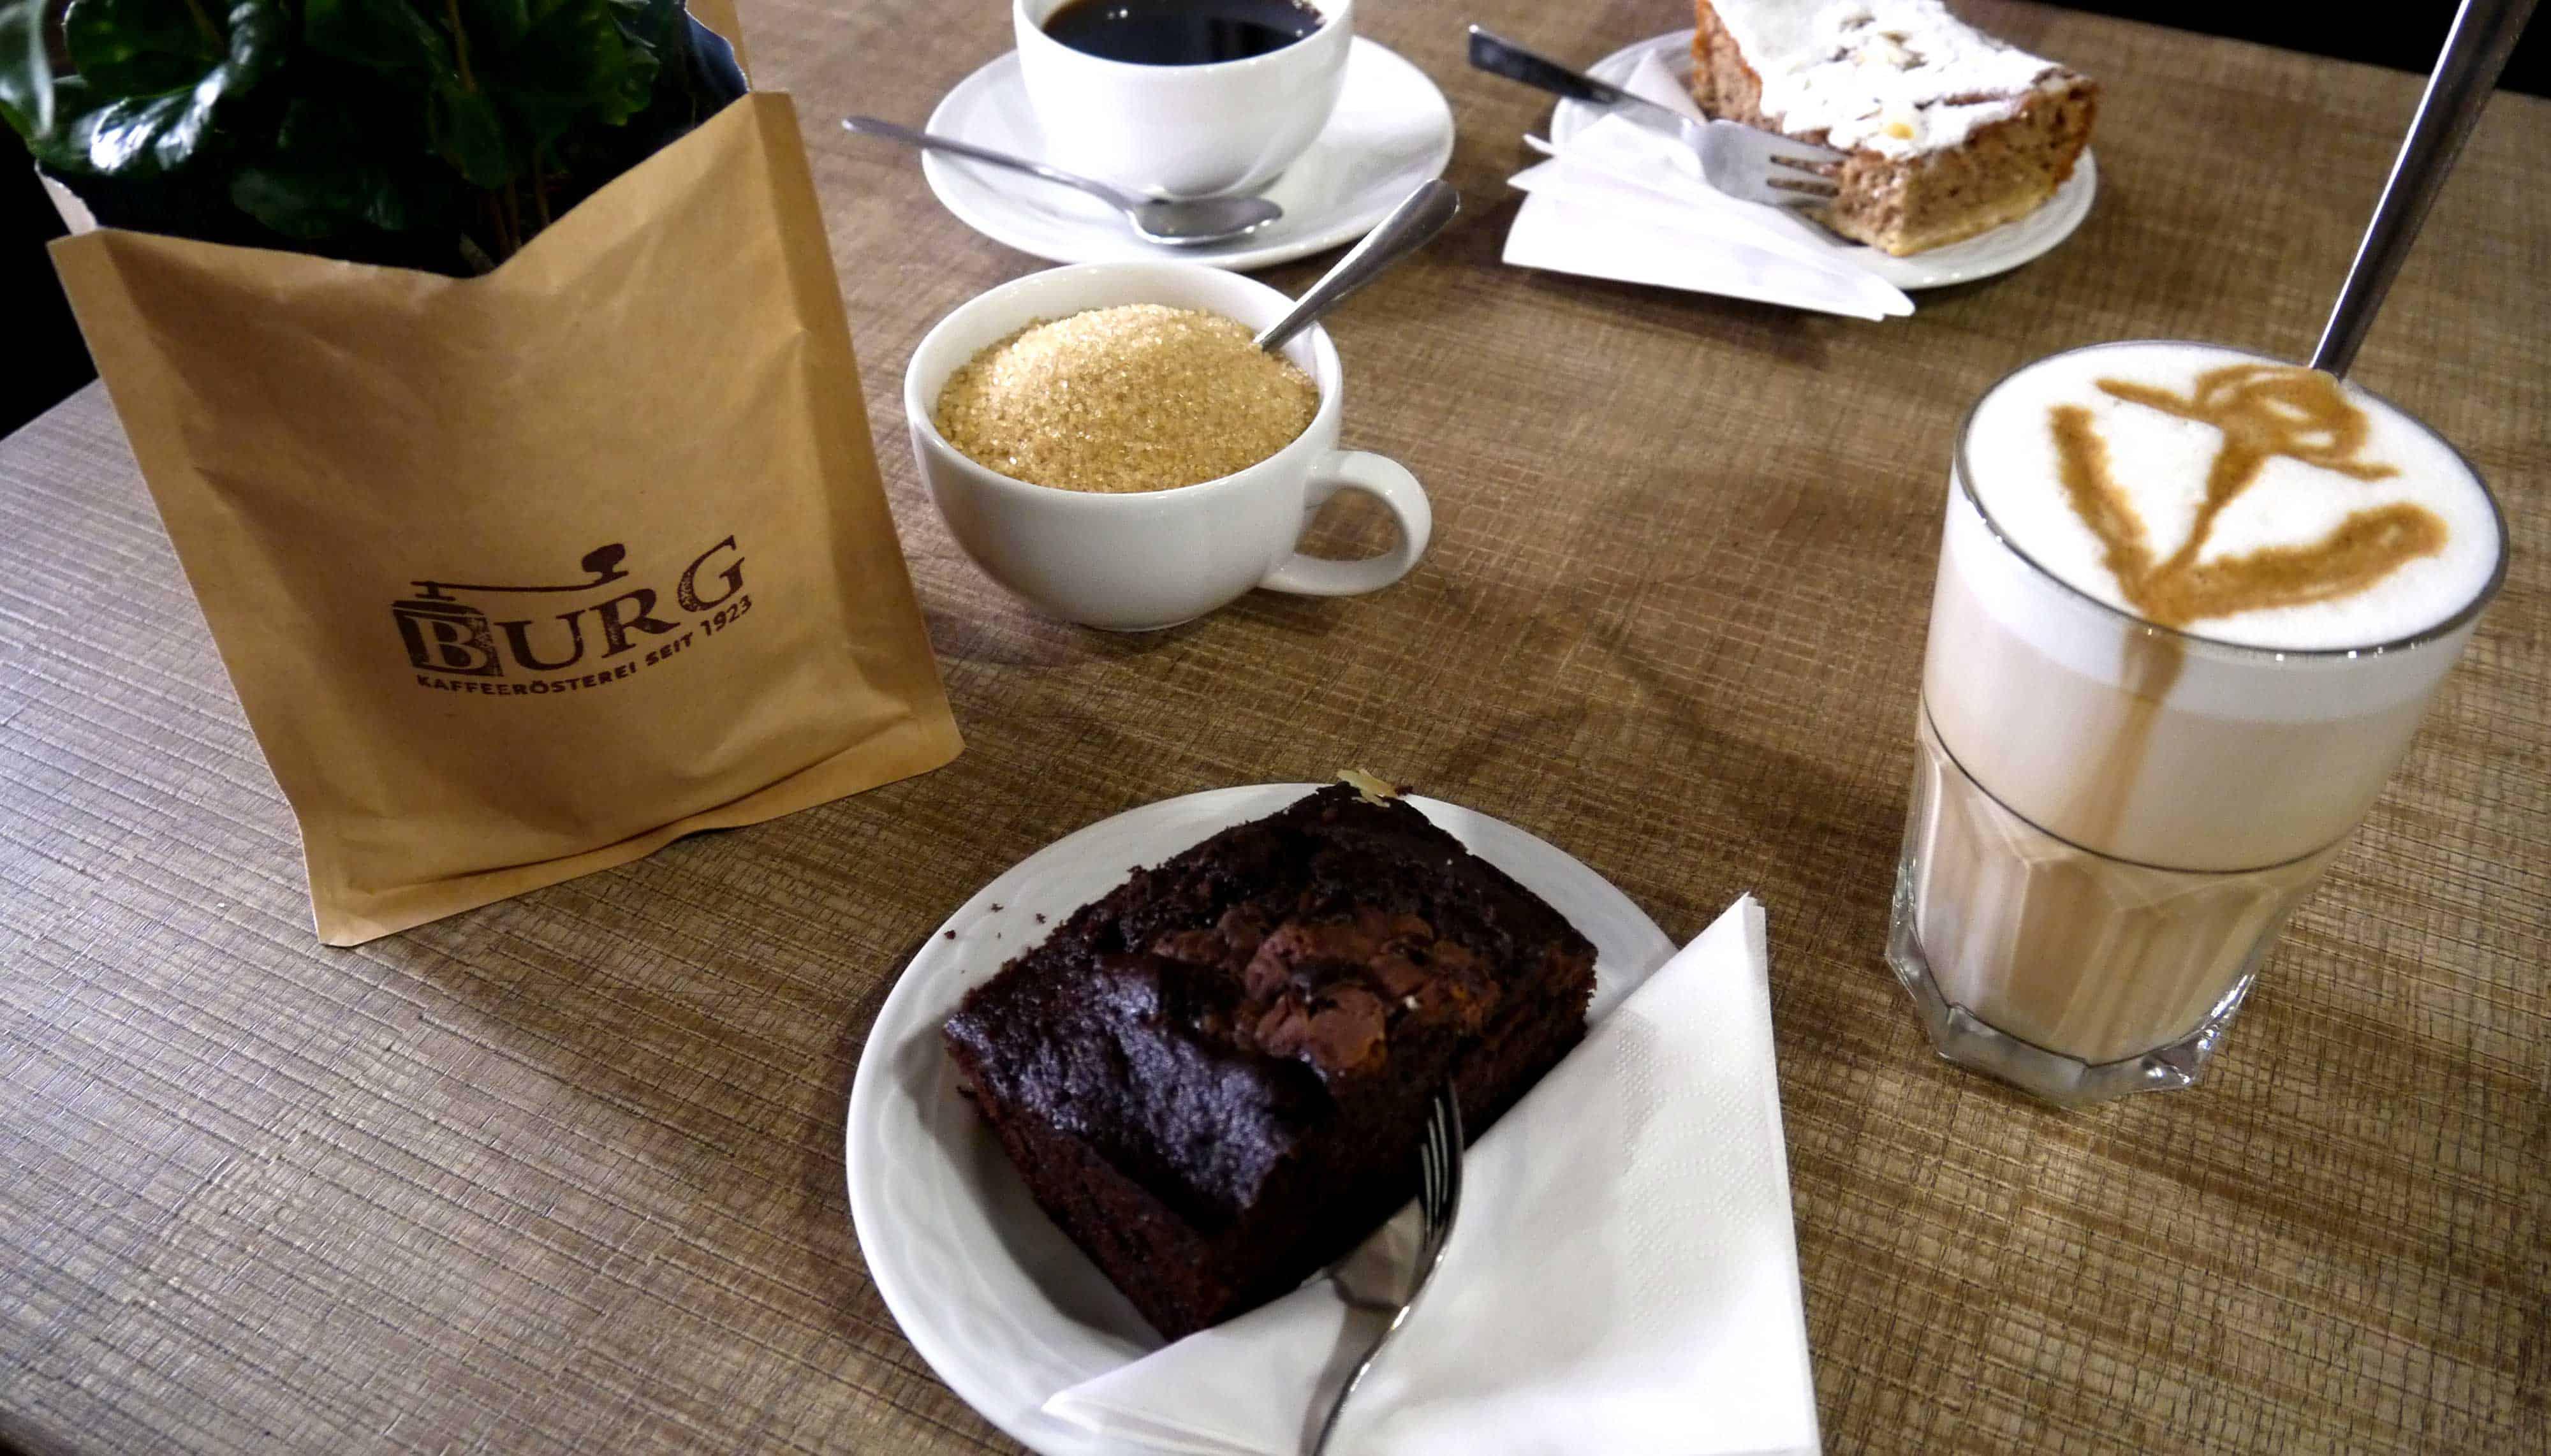 Kaffeepflanze, Kuchen, Glas mit Kaffee